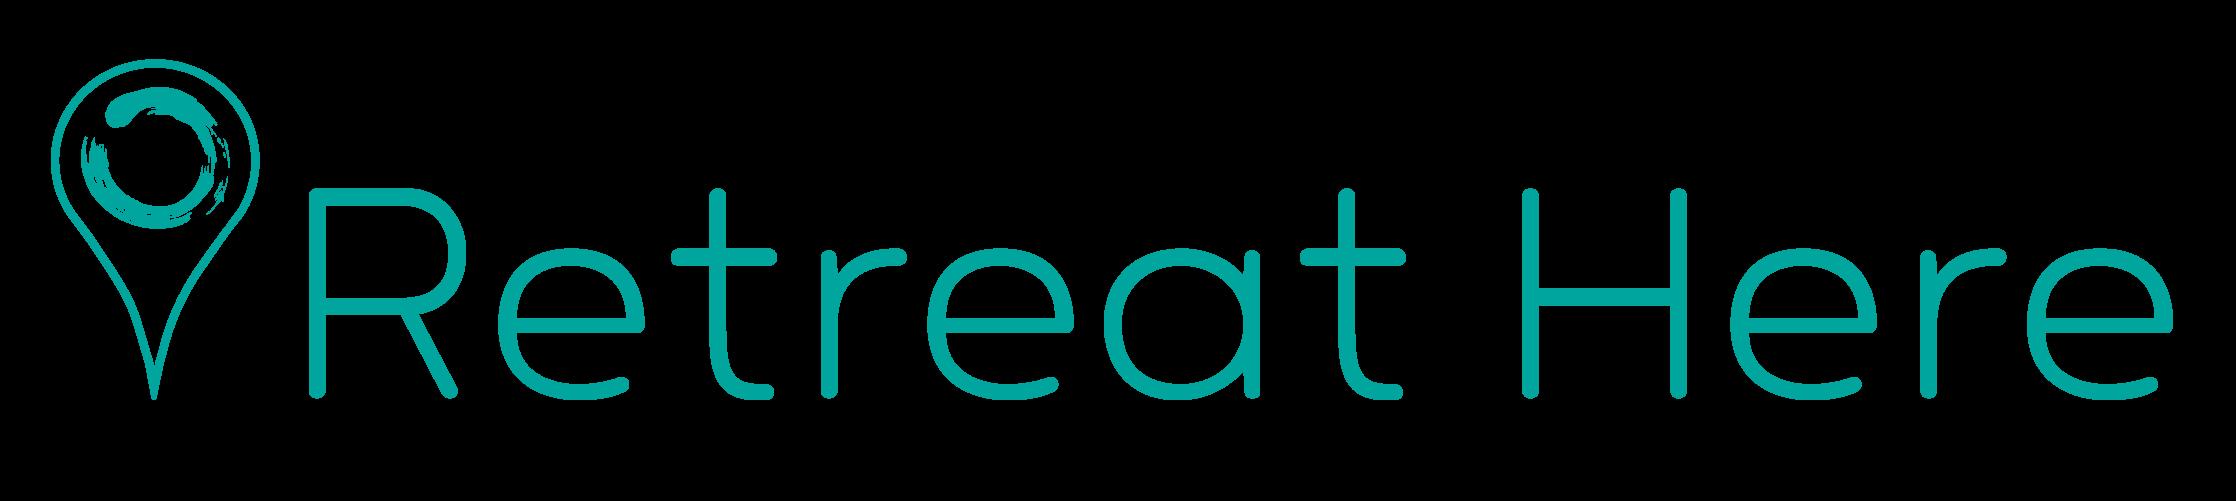 RH-Logo-Text-teal_RGB.png